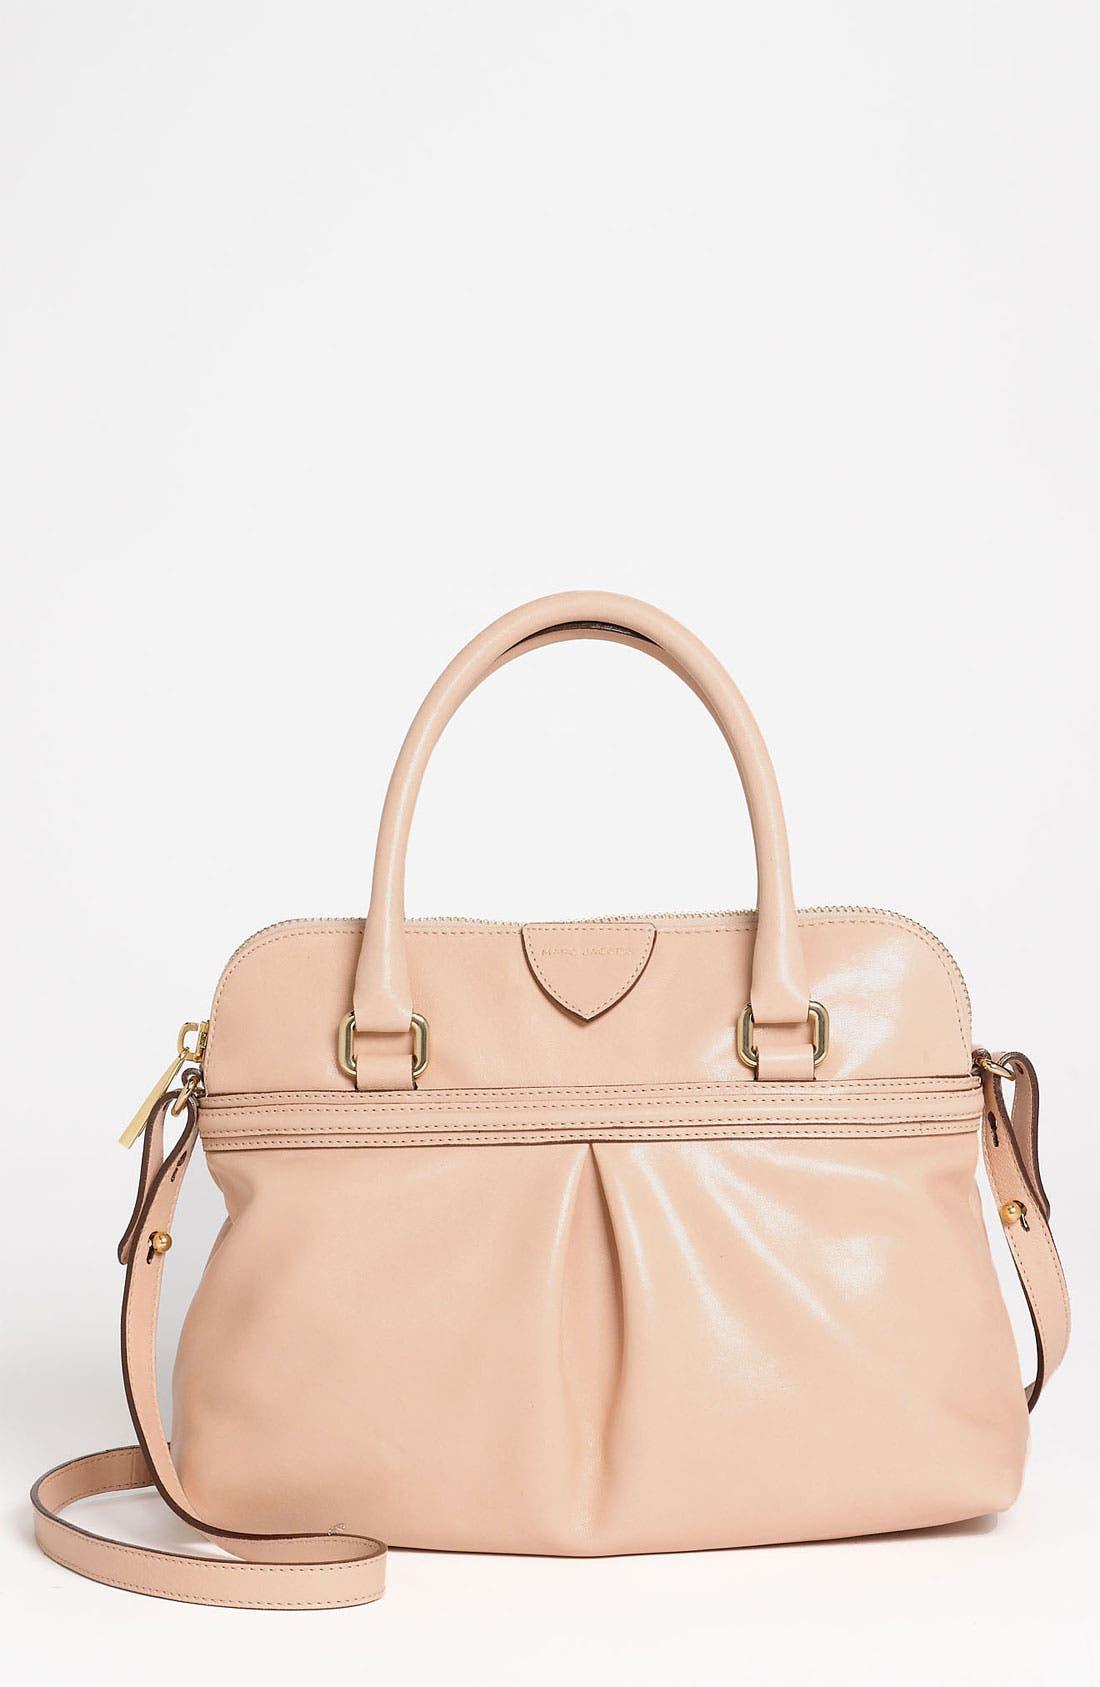 Alternate Image 1 Selected - MARC JACOBS 'Preston' Leather Handbag